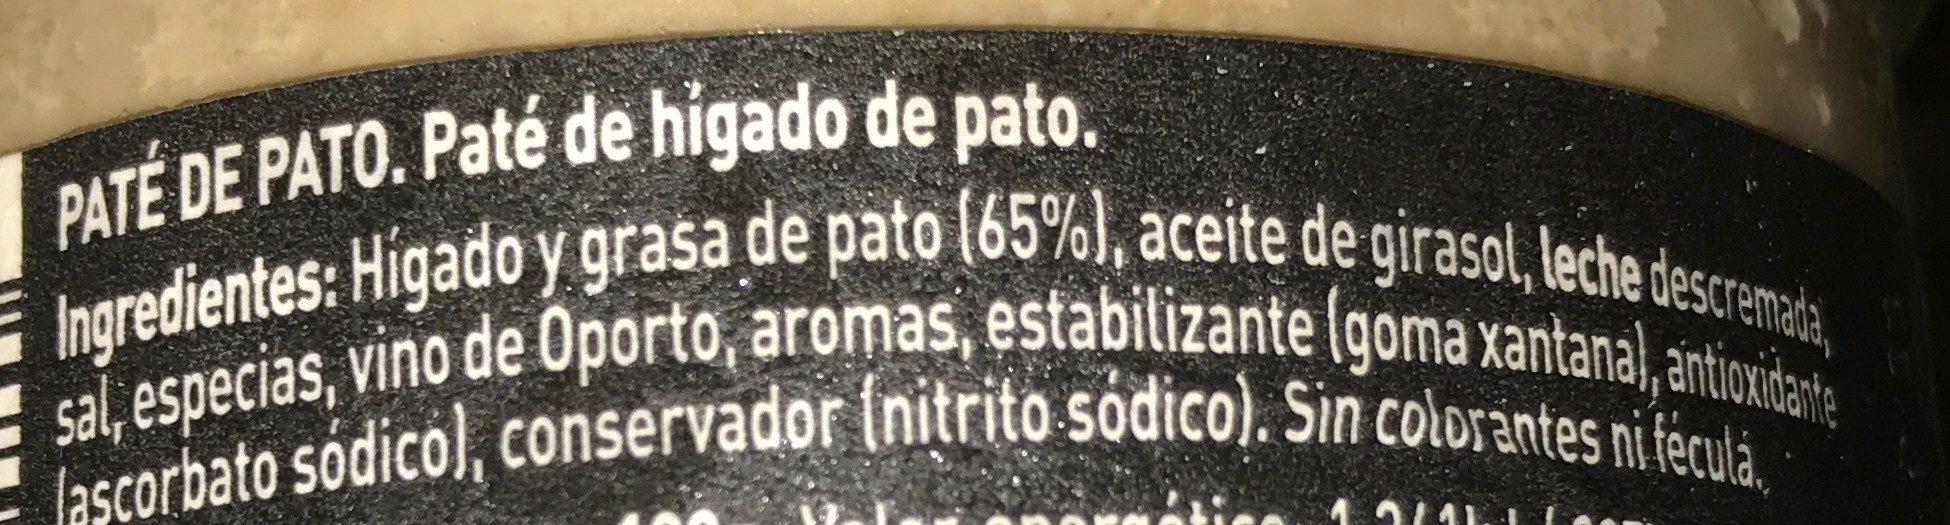 Paté de pato - Ingrediënten